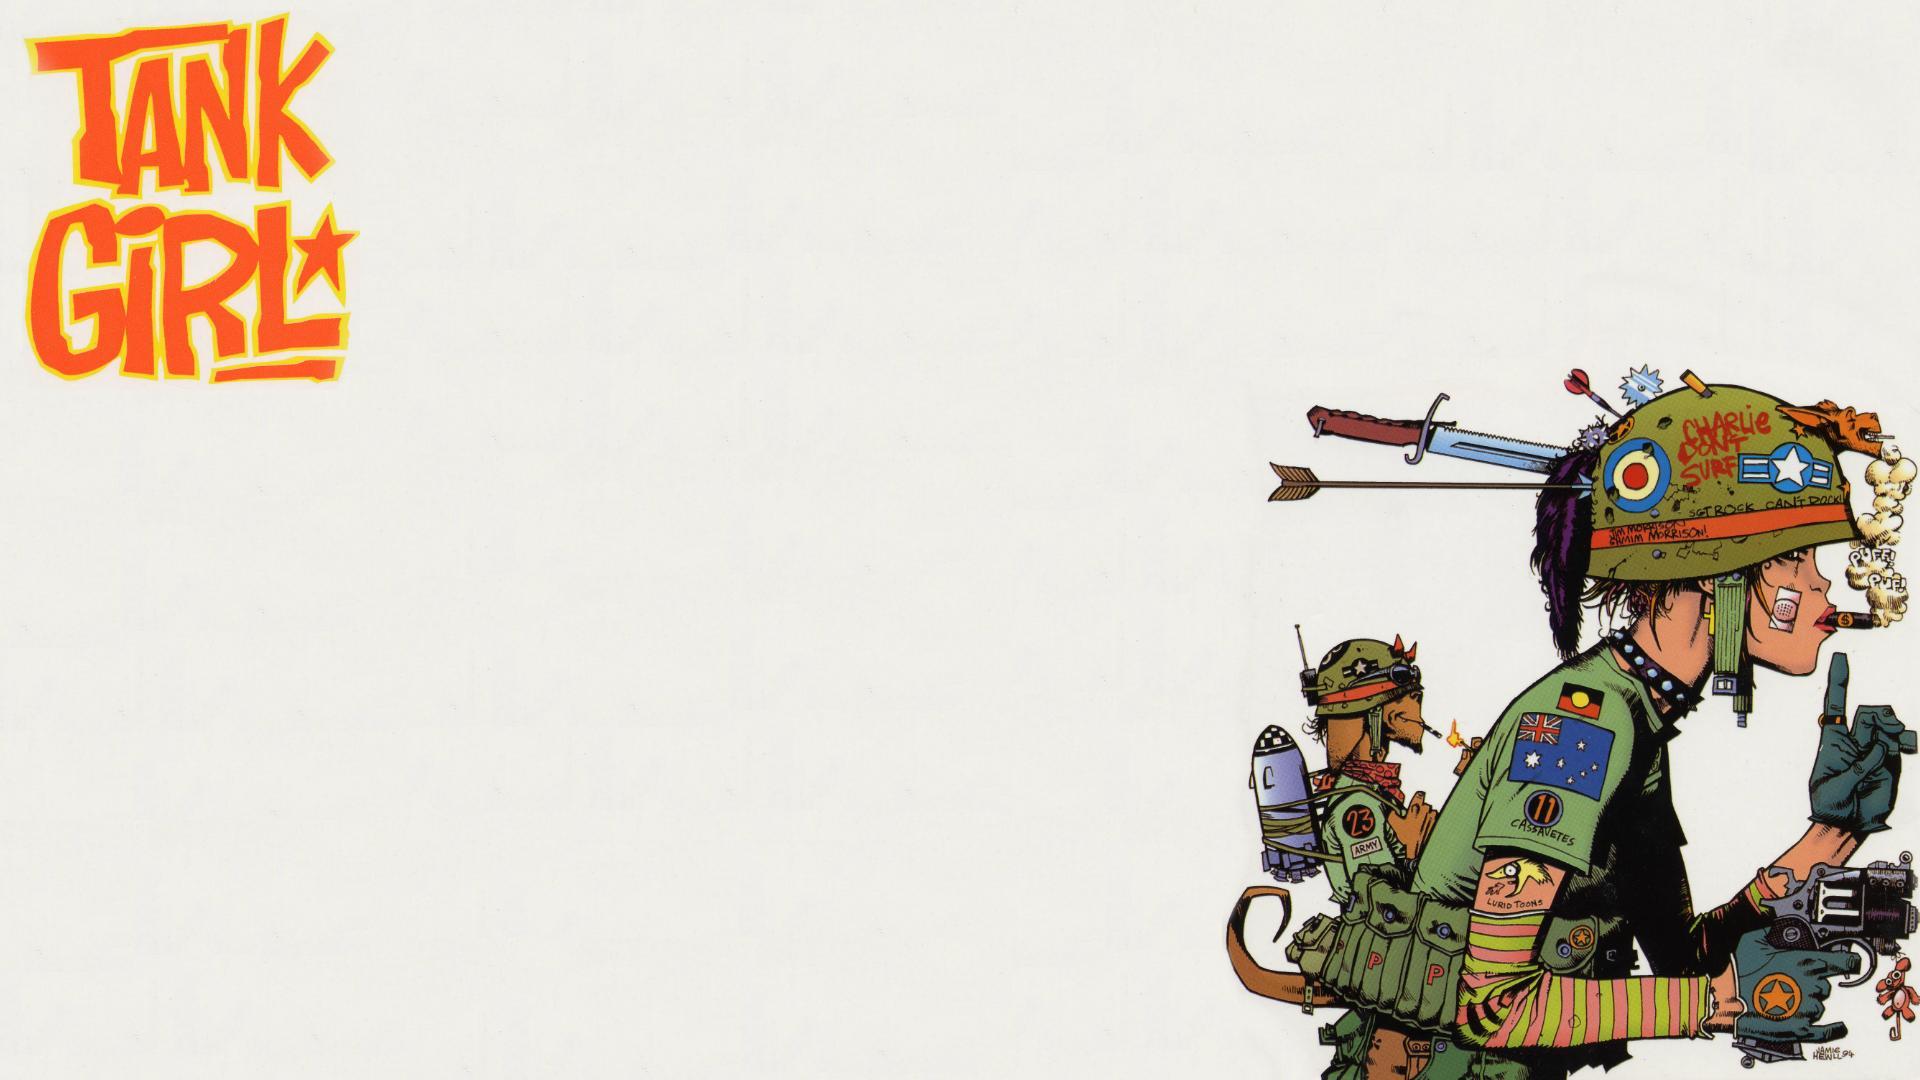 Gorillaz Iphone Wallpaper Tank Girl Full Hd Wallpaper And Background Image